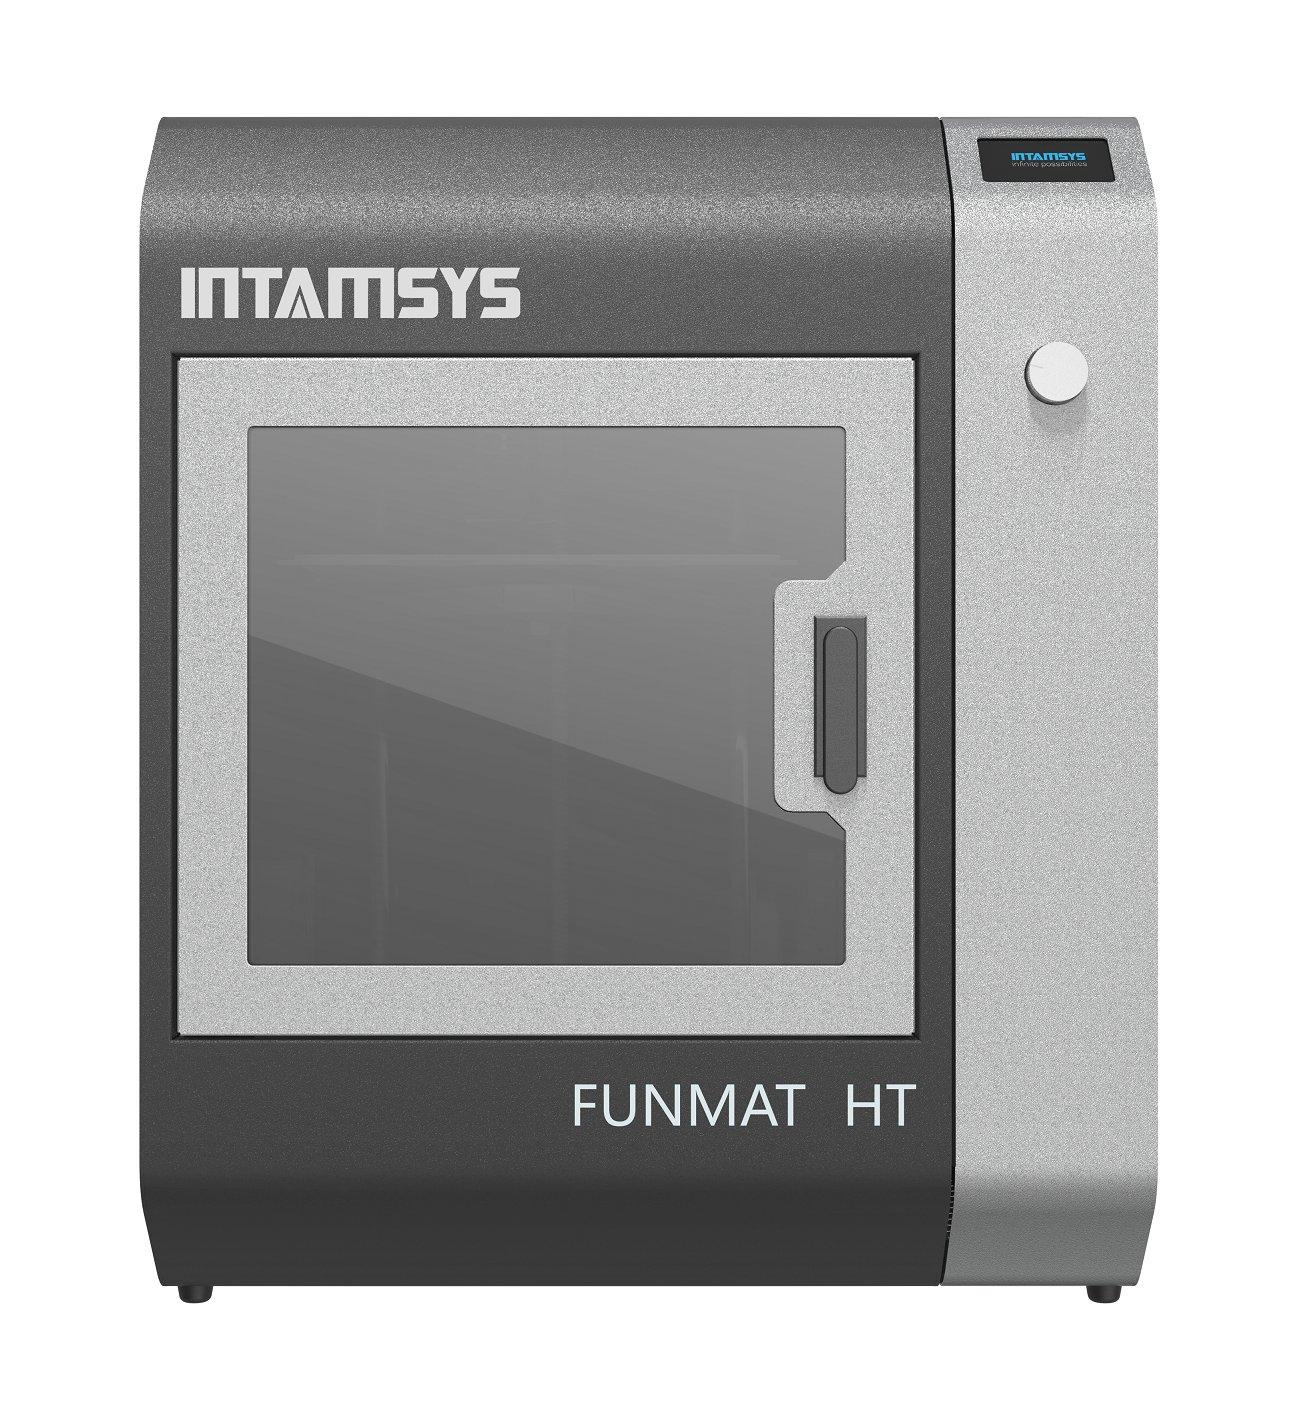 INTAMSYS FUNMAT HT Enhanced画像